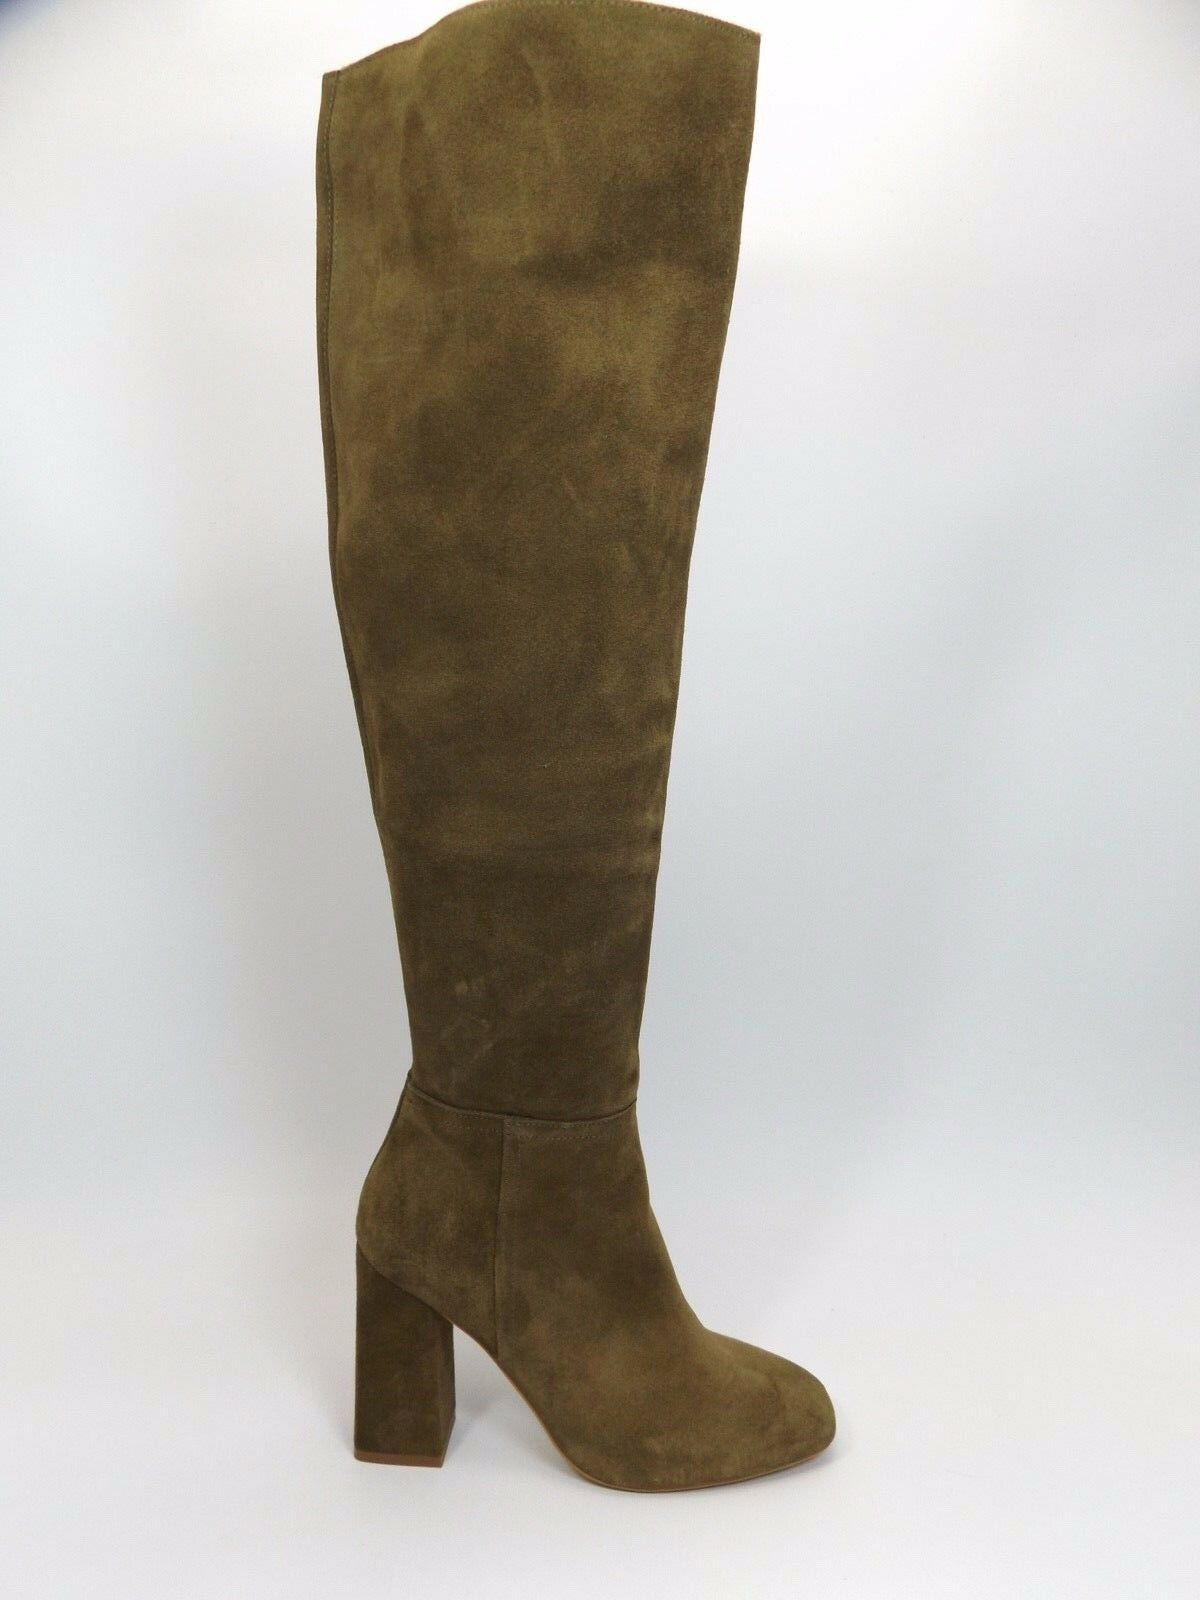 Free People Liberty Heel Boot SZ 6.0-6.5 M  Green Brown Suede MSRP   228  D2483